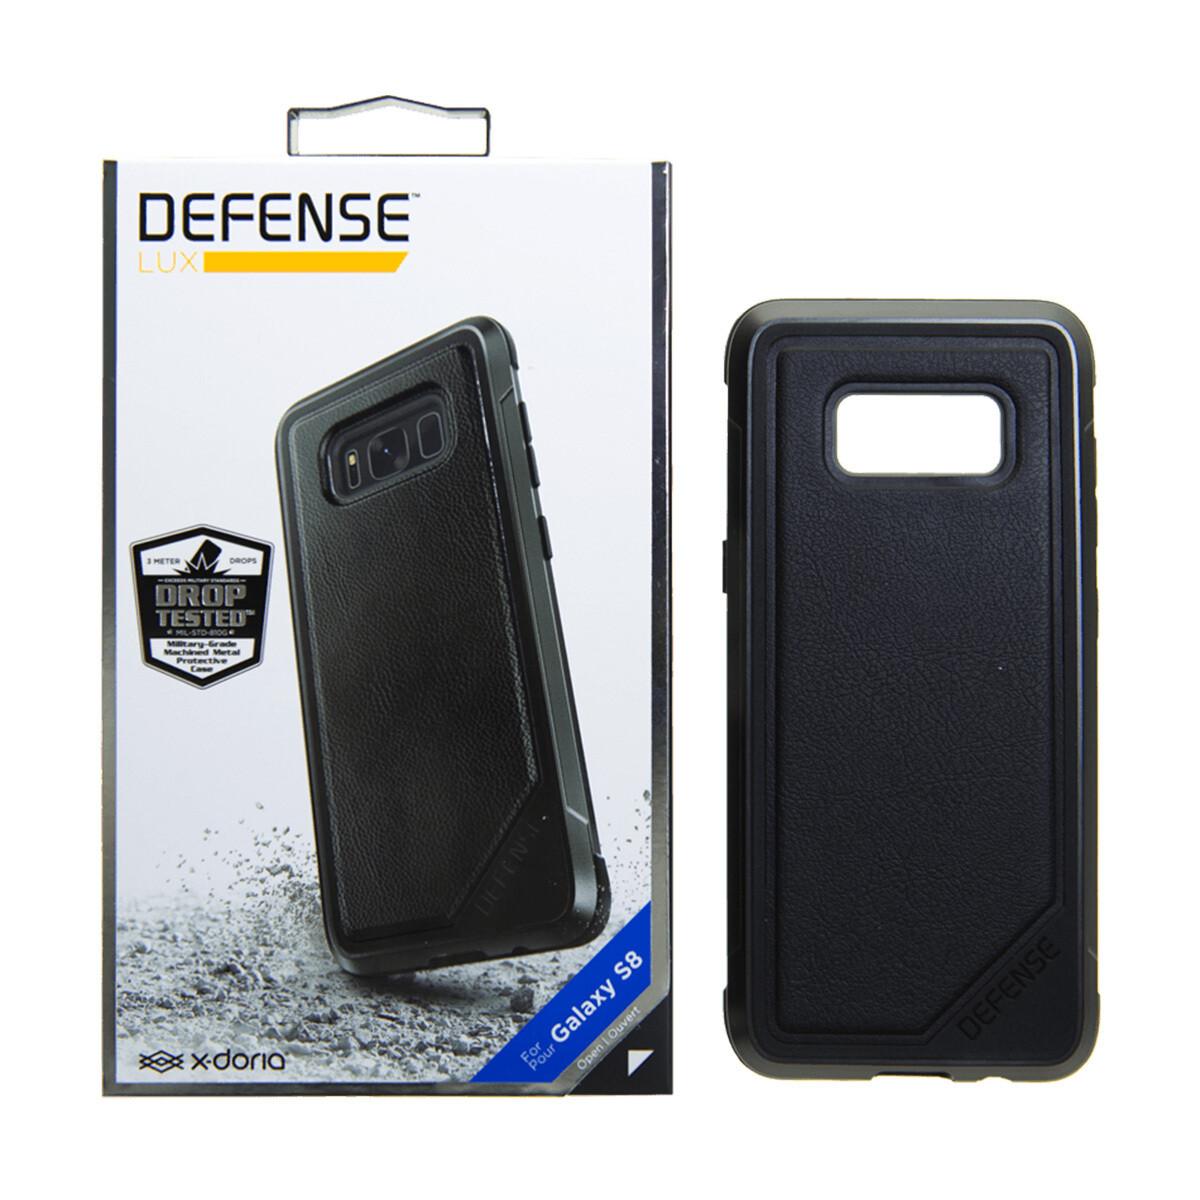 Estuche XDORIA Defense Lux Cuero Negro S8